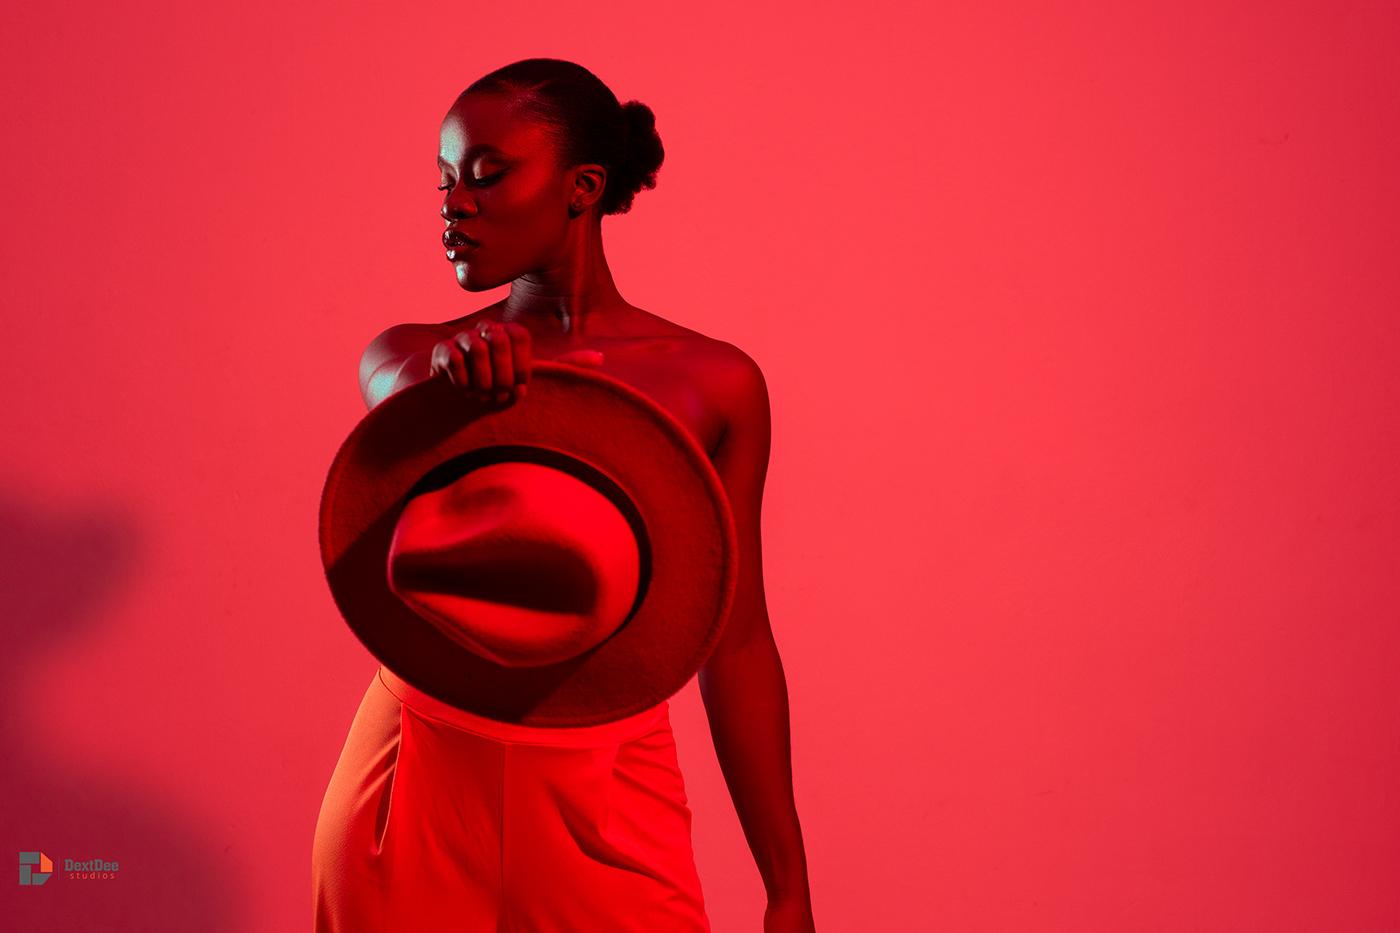 color DextDee Studios Ghana hat red shade woman